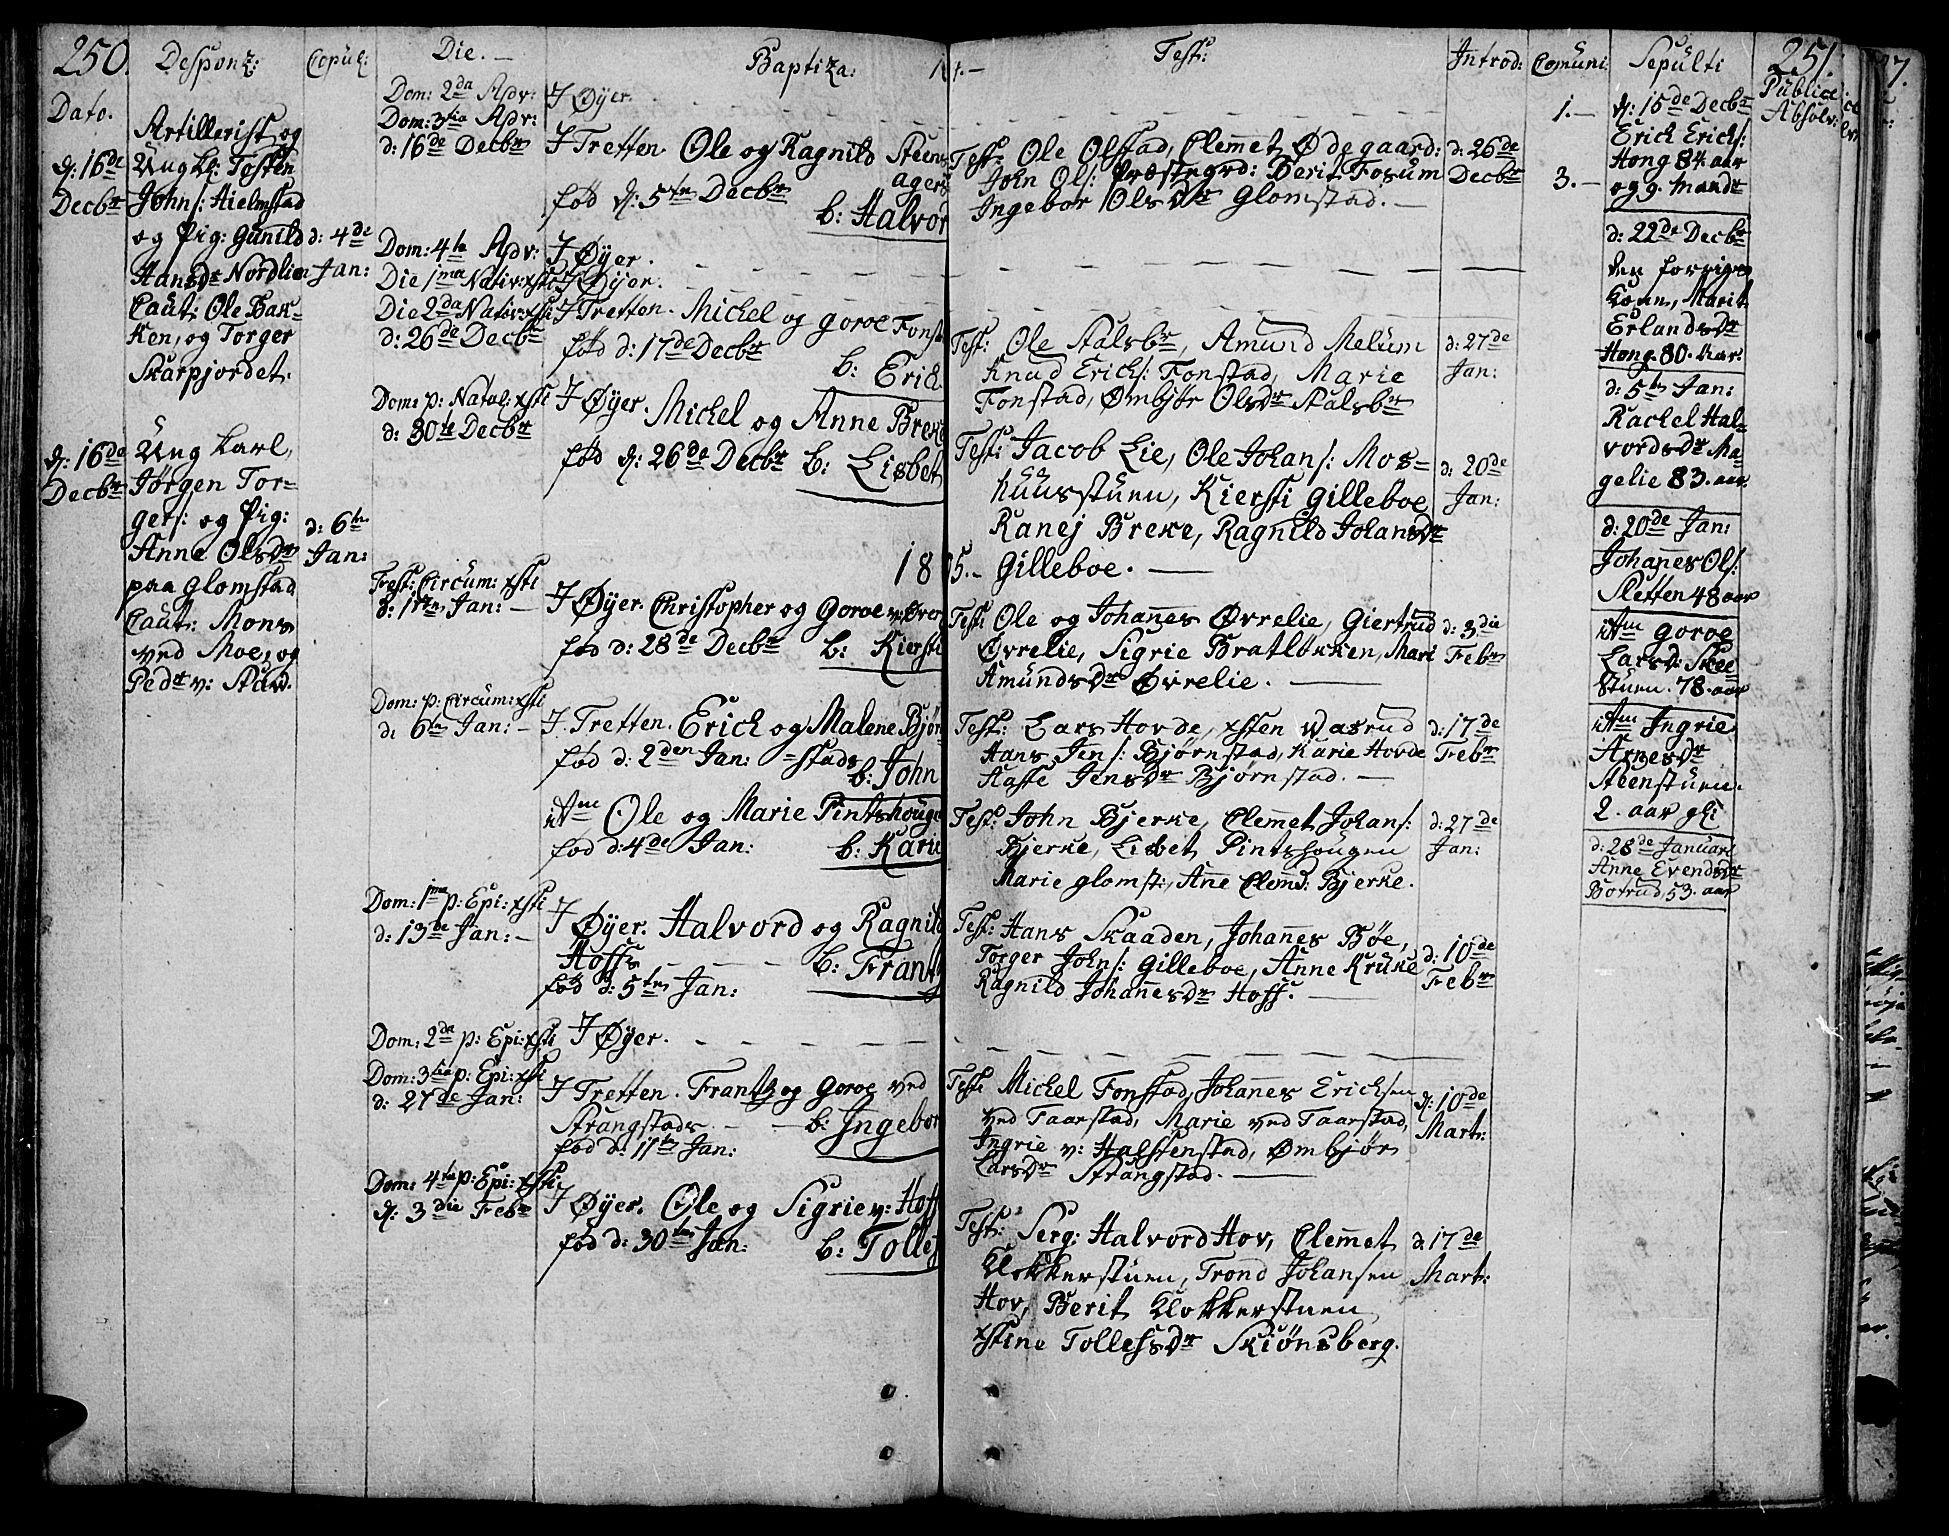 SAH, Øyer prestekontor, Ministerialbok nr. 3, 1784-1824, s. 250-251